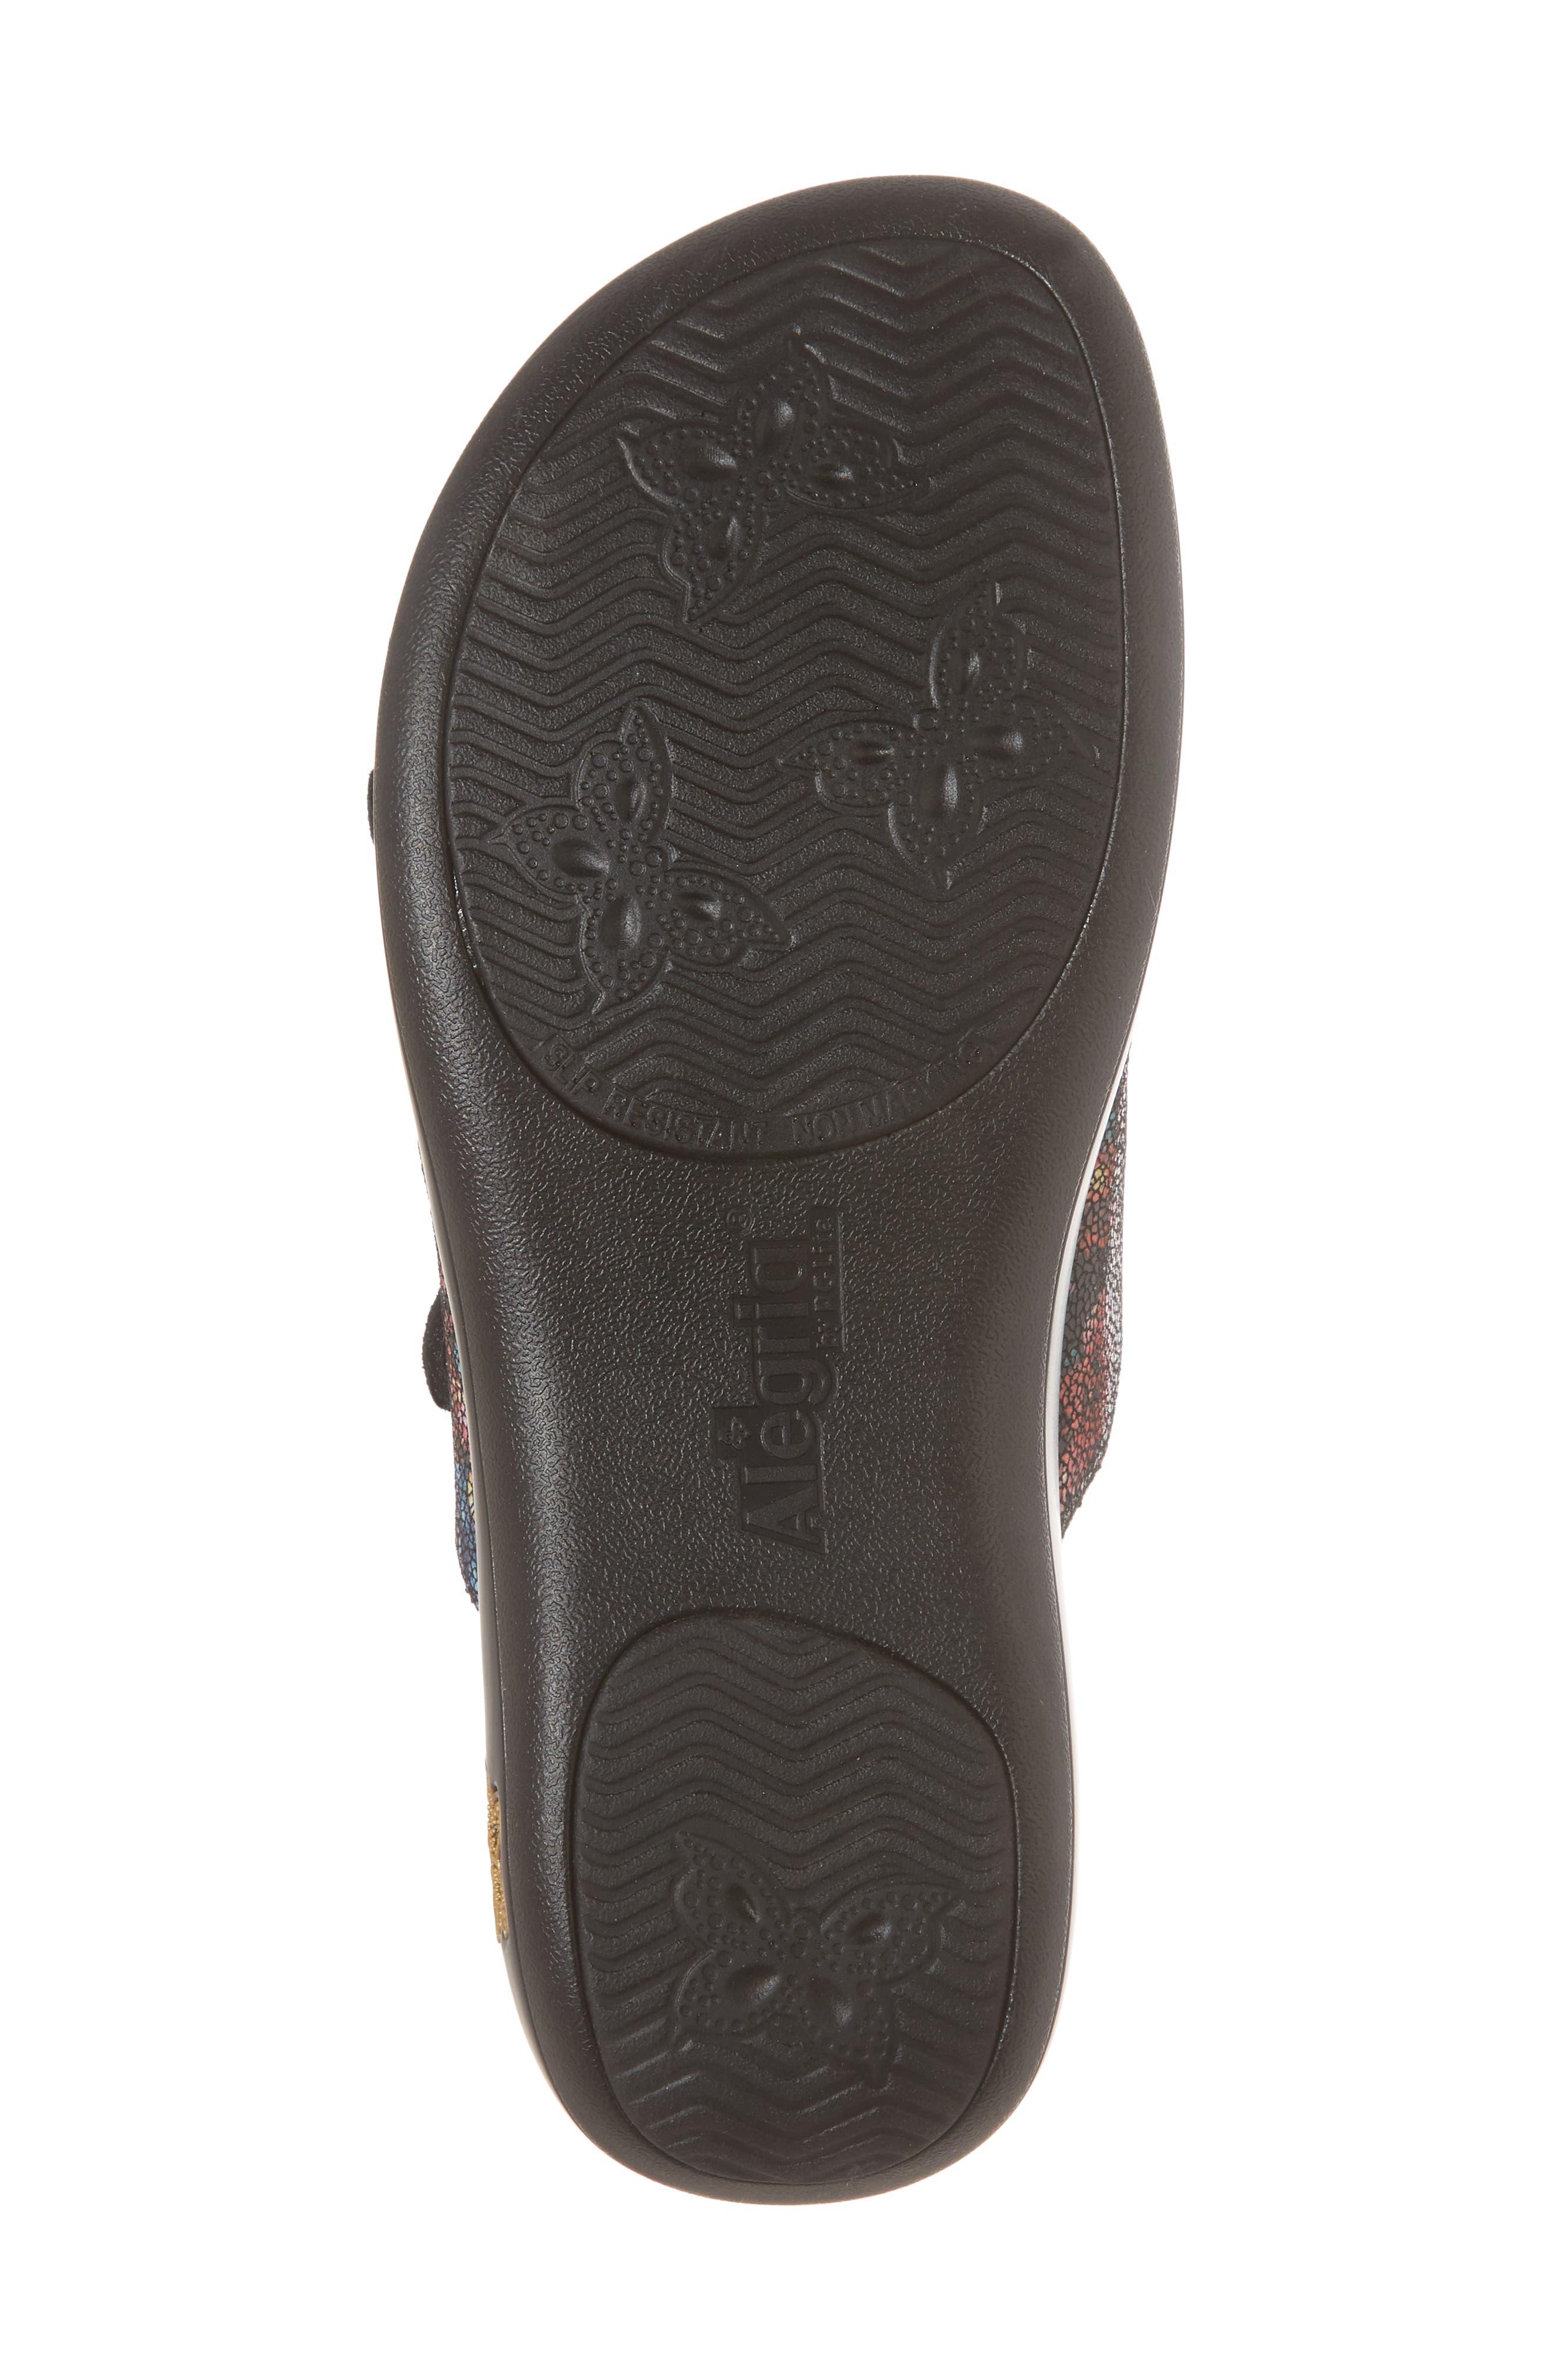 Jade Sandal,                             Alternate thumbnail 6, color,                             Florensic Files Leather